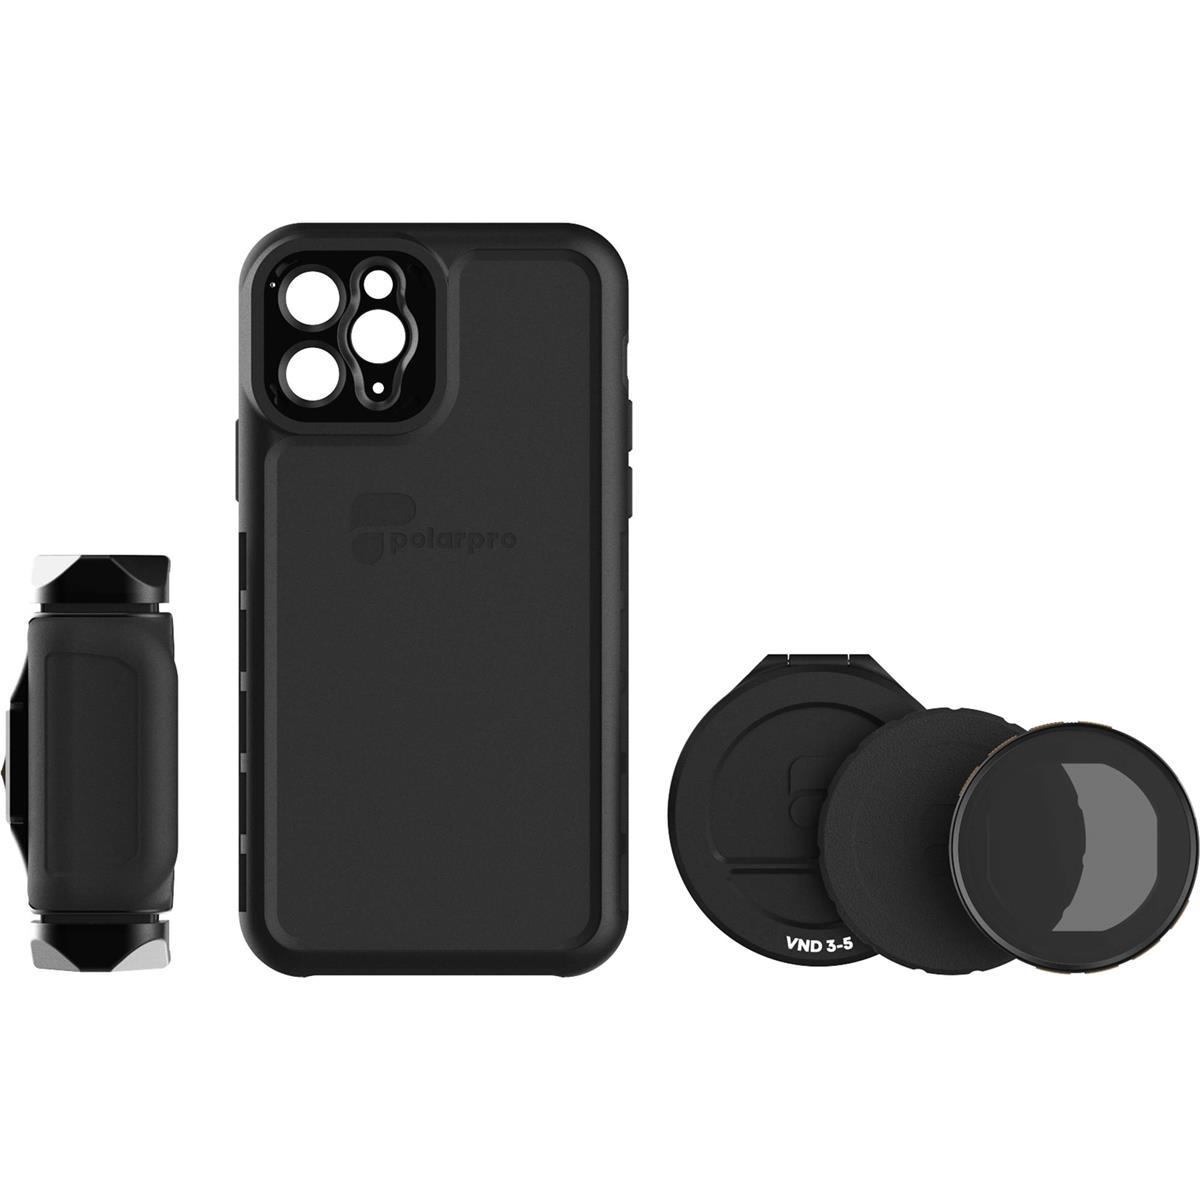 Polar Pro LiteChaser Pro Filmmaker Kit for iPhone 11 and 11 Pro  - Adorama.com $39.99